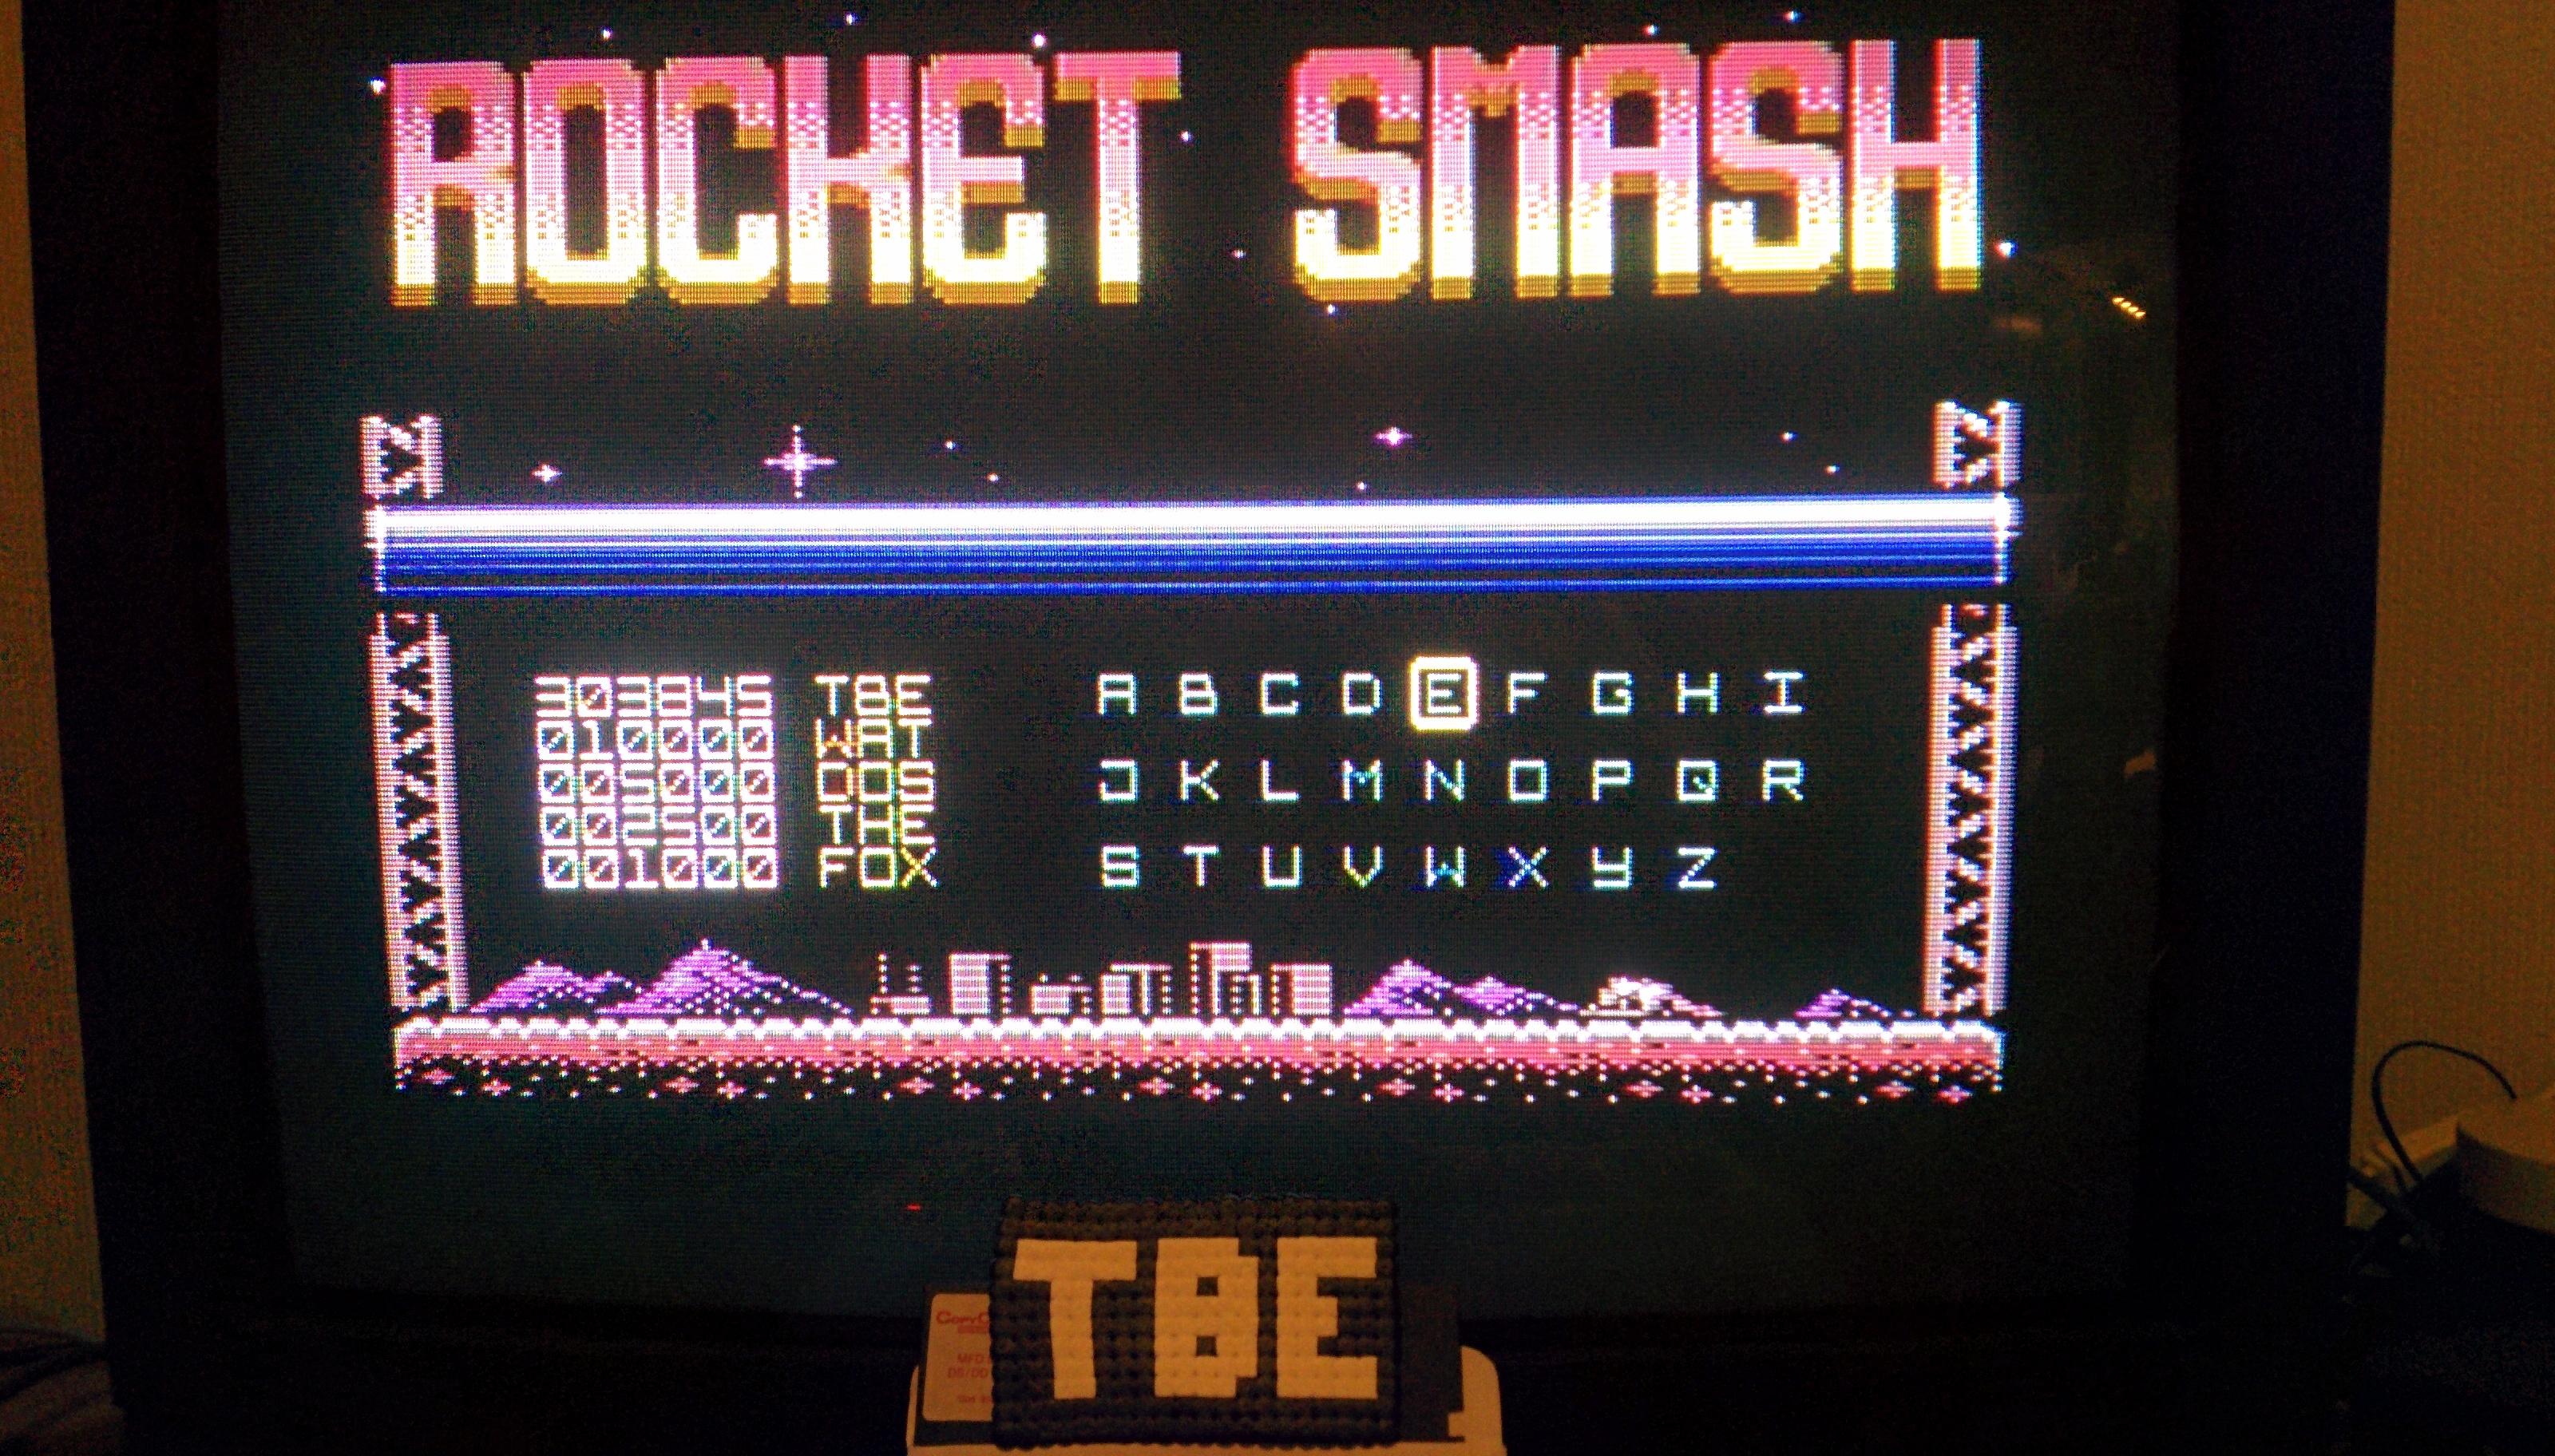 Rocket Smash 303,845 points